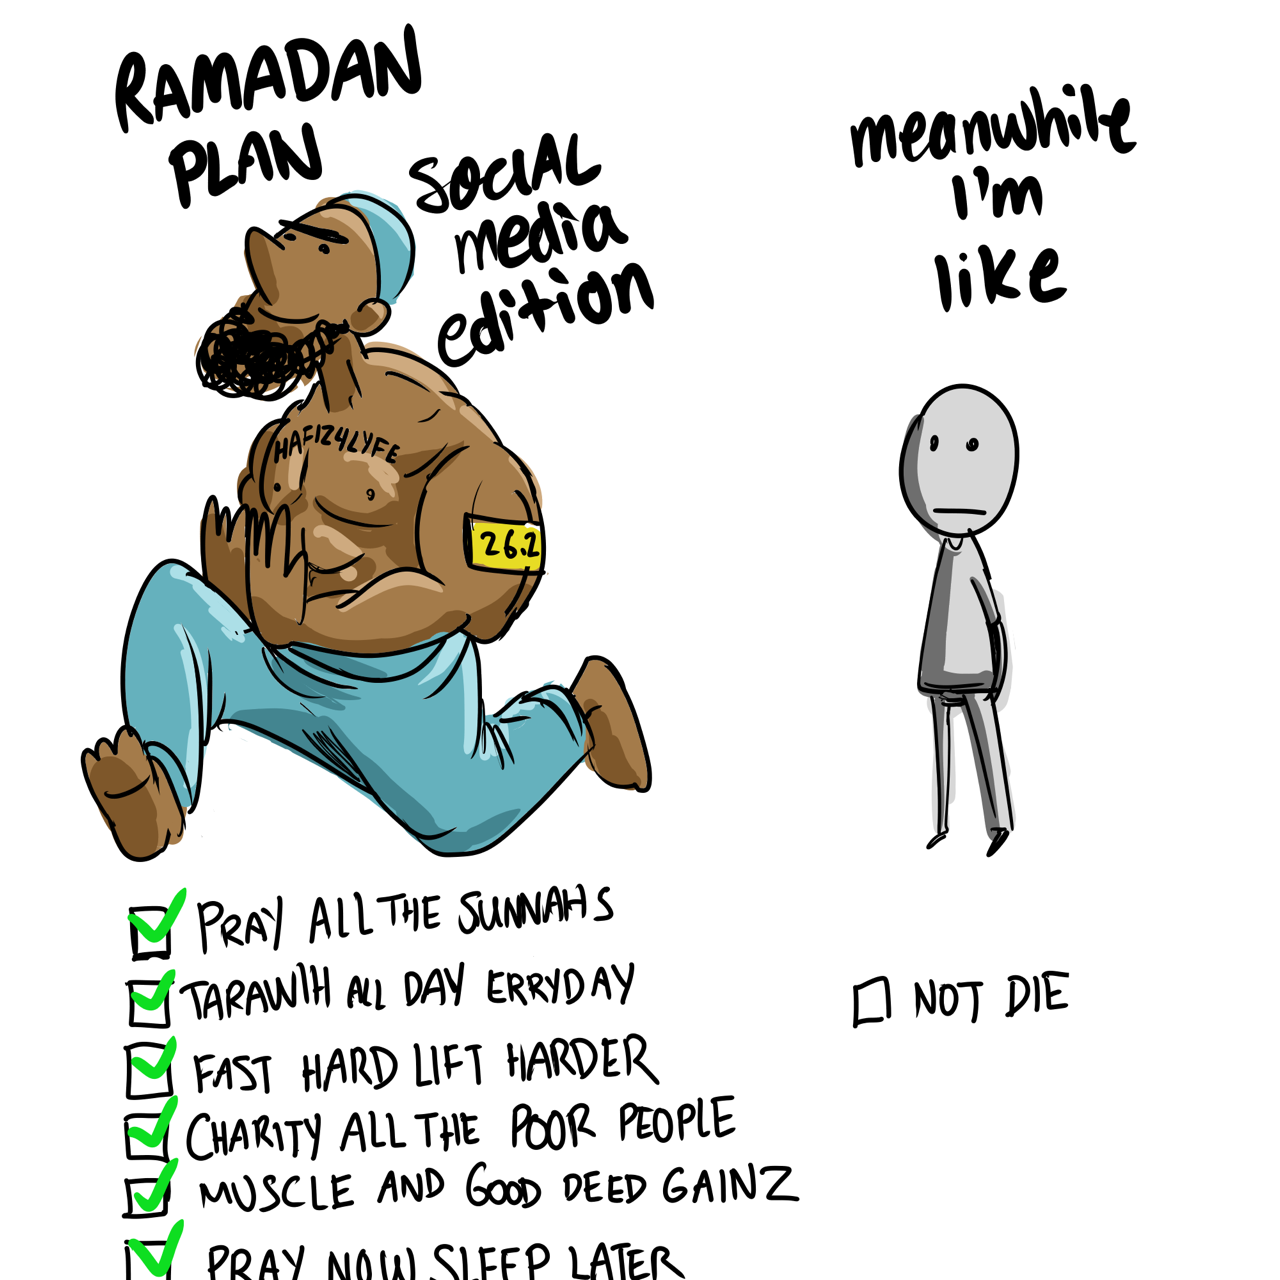 Ramadan idea 6 share dates with your neighbours funny stuff memes ramadan islam meme